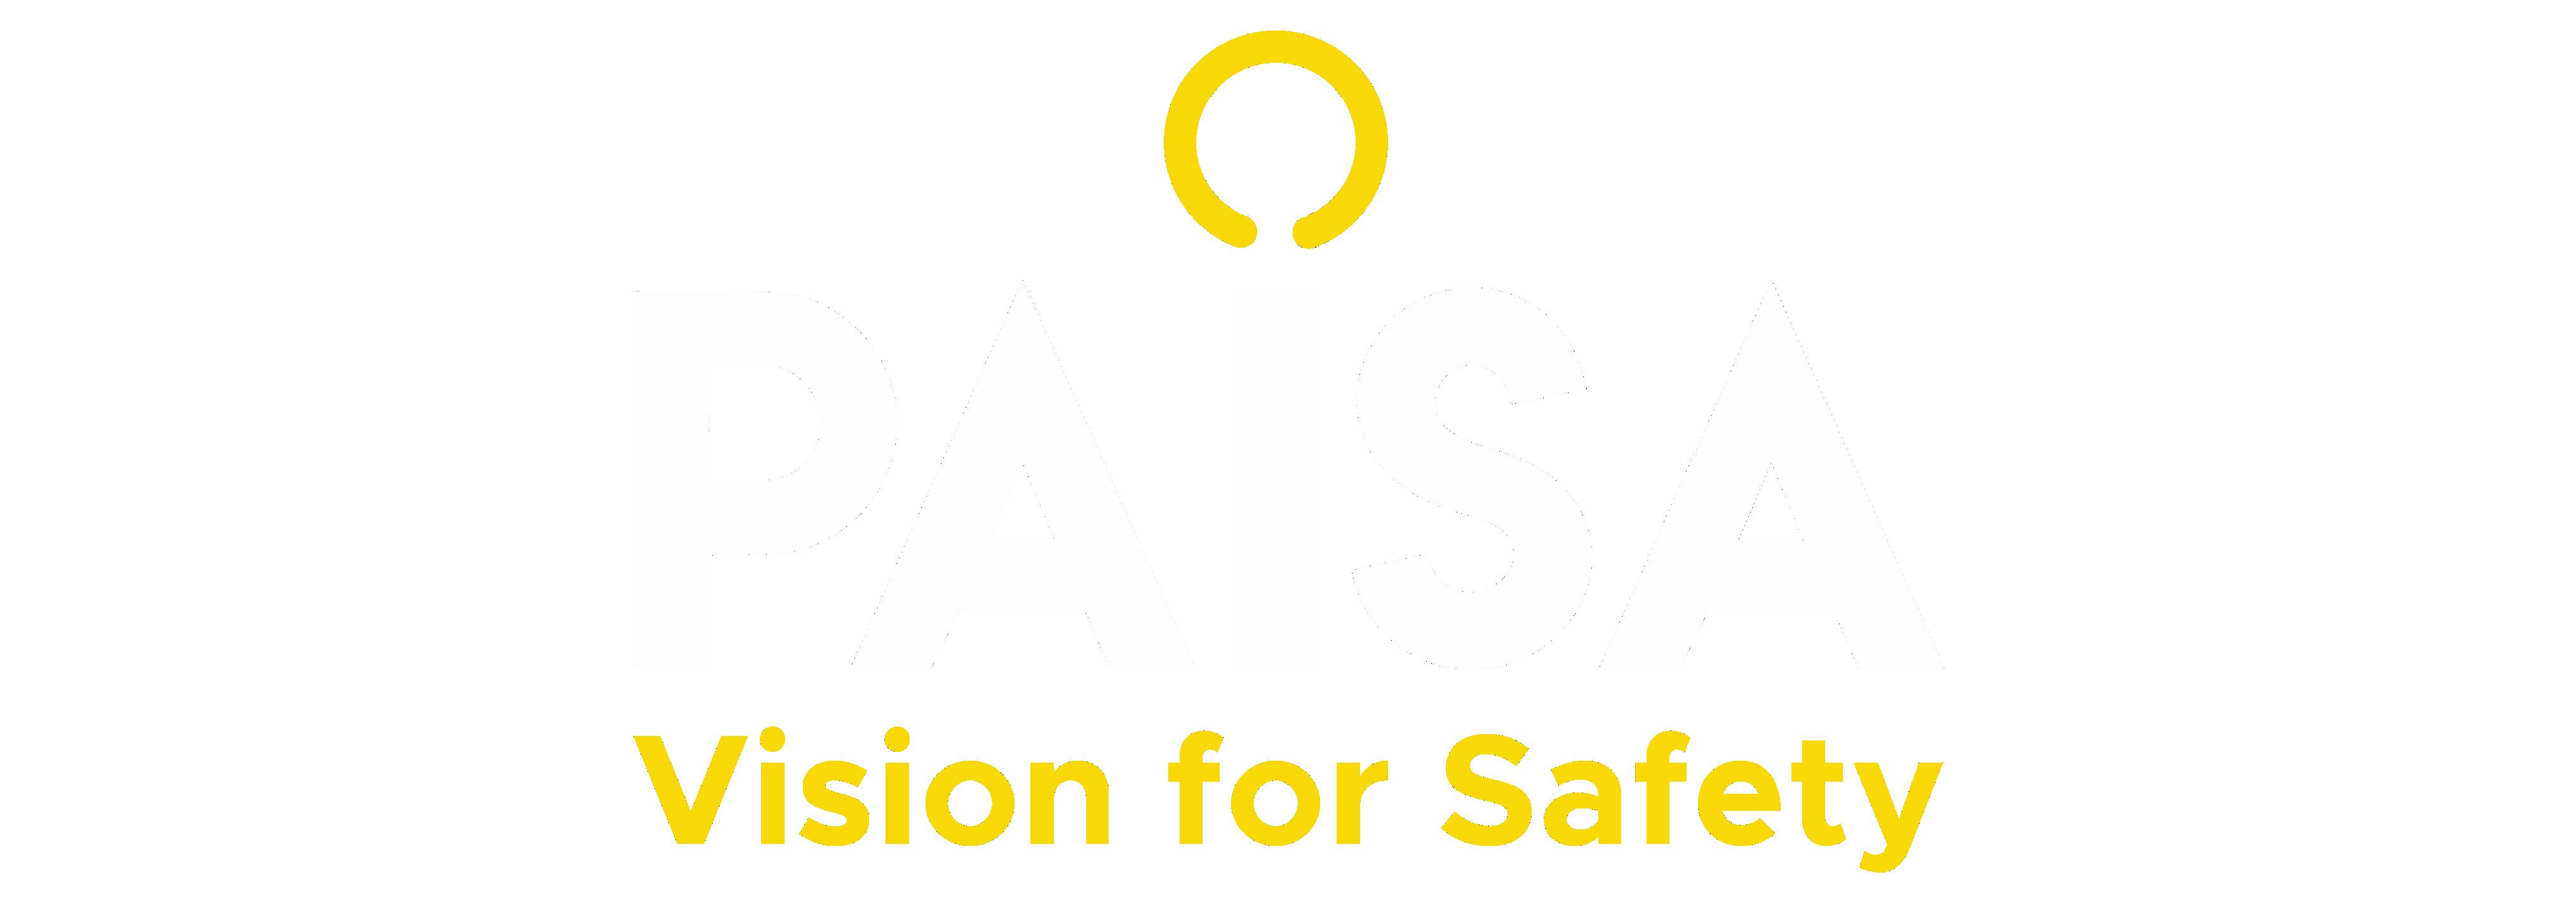 Paisa Technology